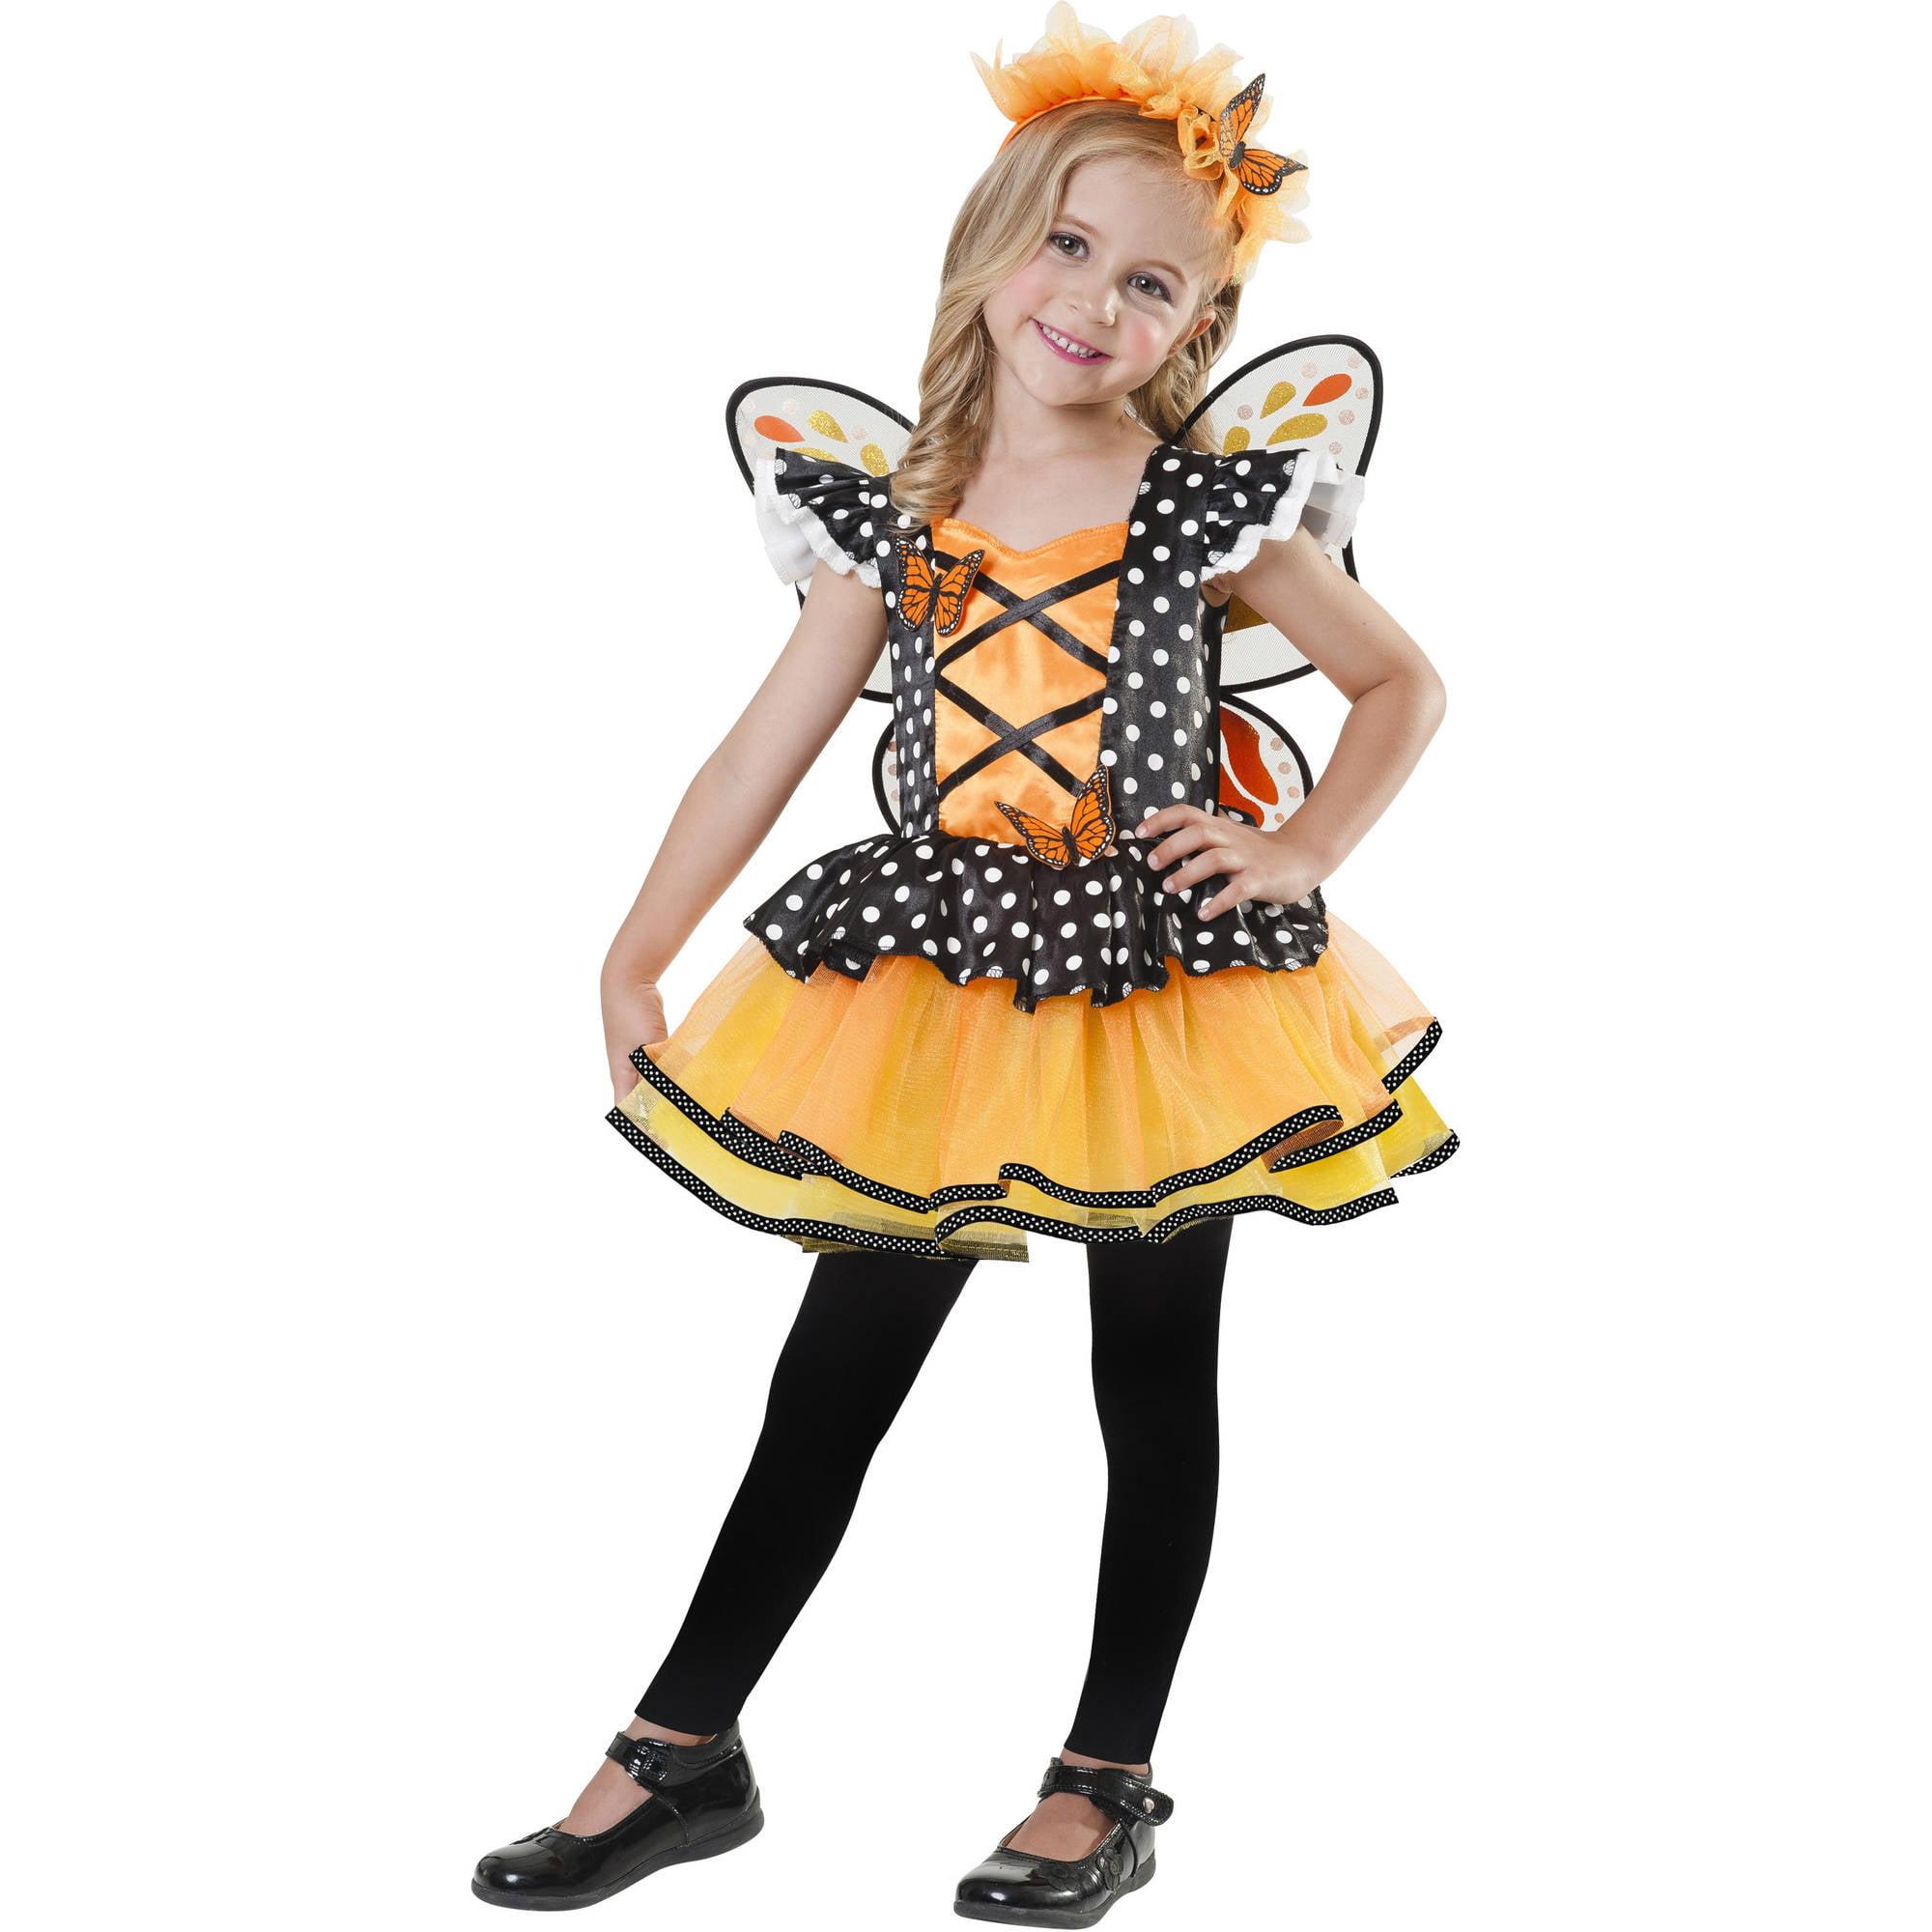 Monarch Fairy Toddler Halloween Costume  sc 1 st  Walmart & Monarch Fairy Toddler Halloween Costume - Walmart.com